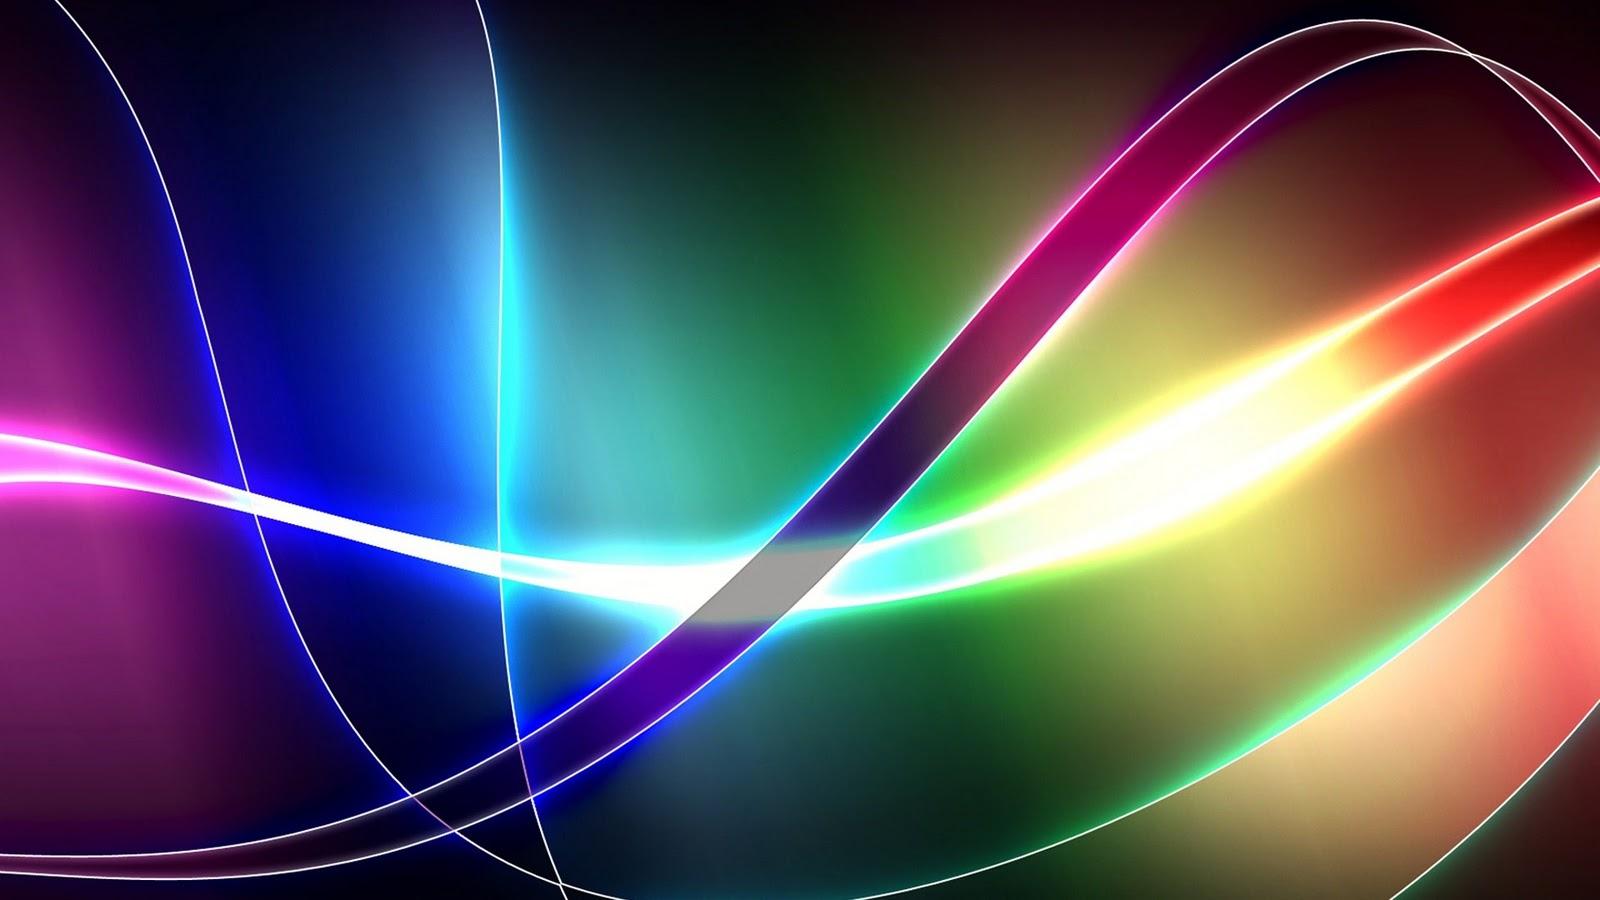 Free Beautiful Desktop Wallpapers,Background Wallpapers ...